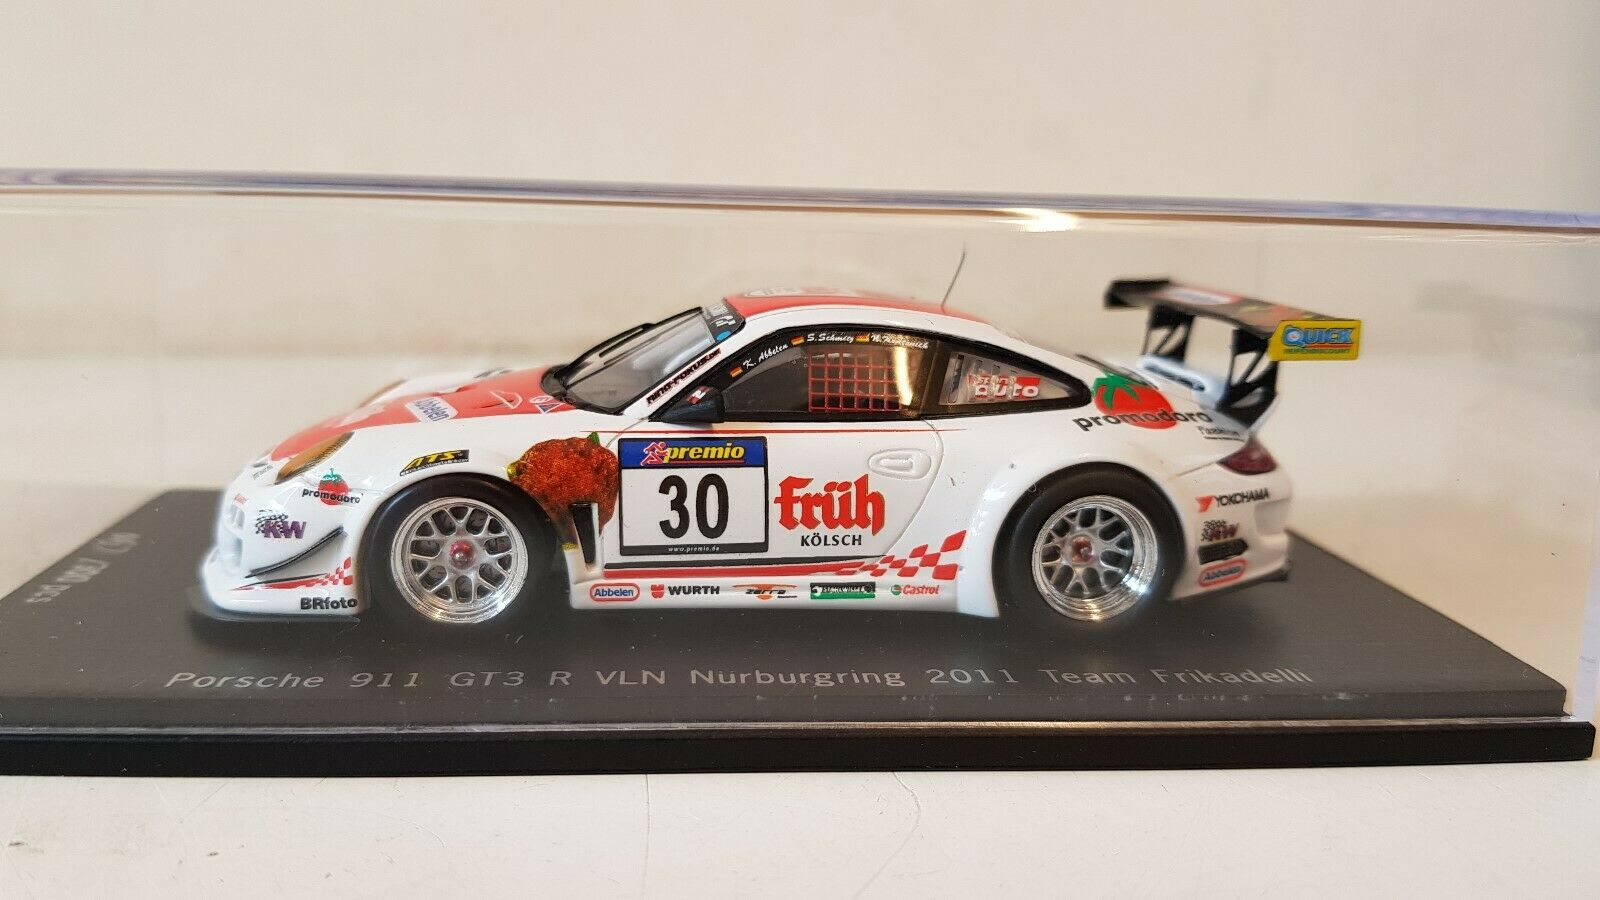 Spark-Porsche 911 GT3 R Frikadelli Racing Vln Nurburgring 2011  30 1 43